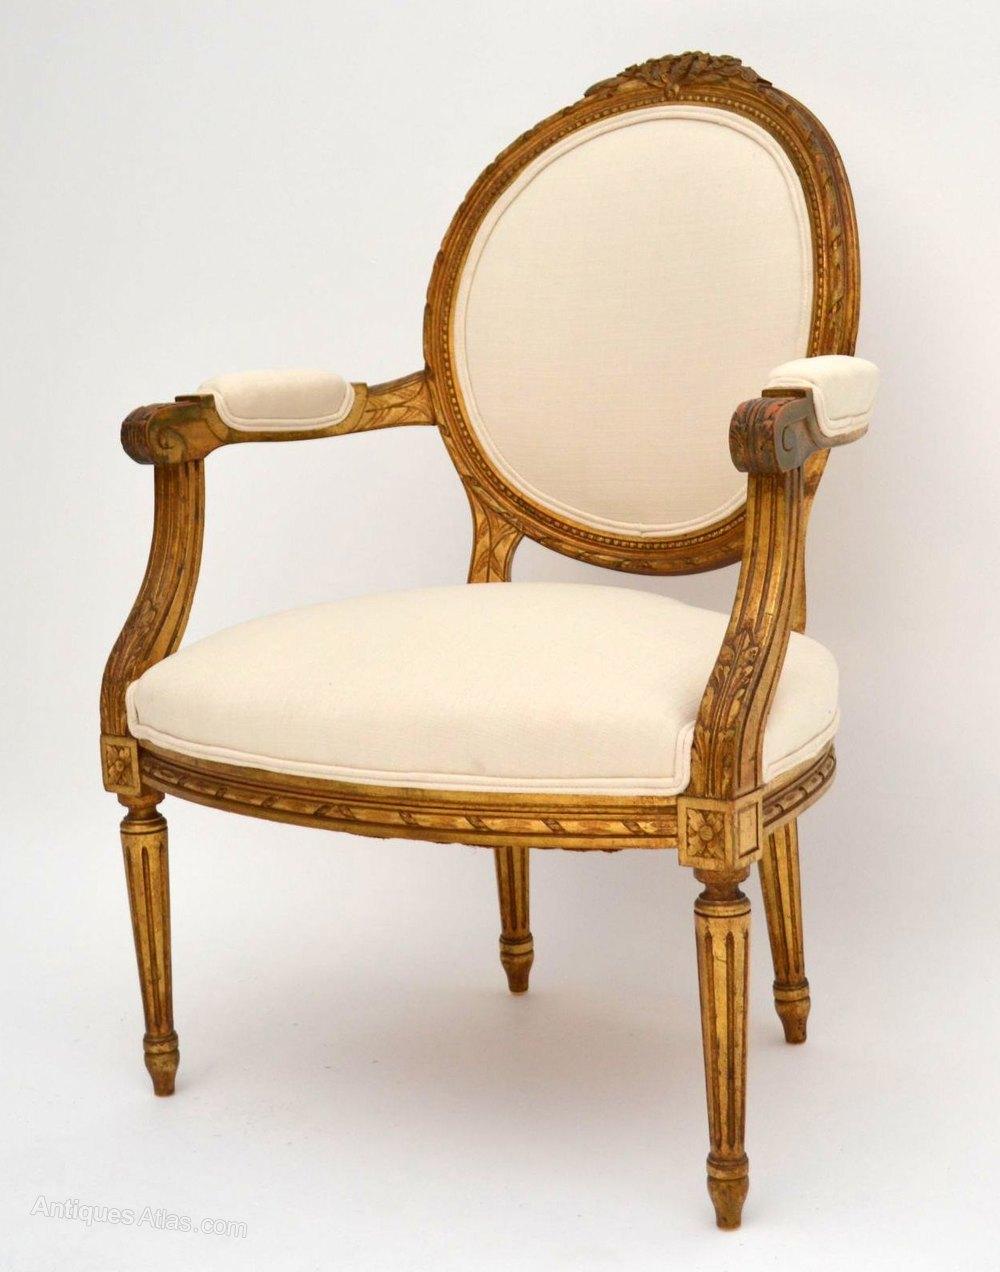 ... Antique Salon Chairs ... - Pair Of Antique French Gilt Wood Salon Armchairs - Antiques Atlas